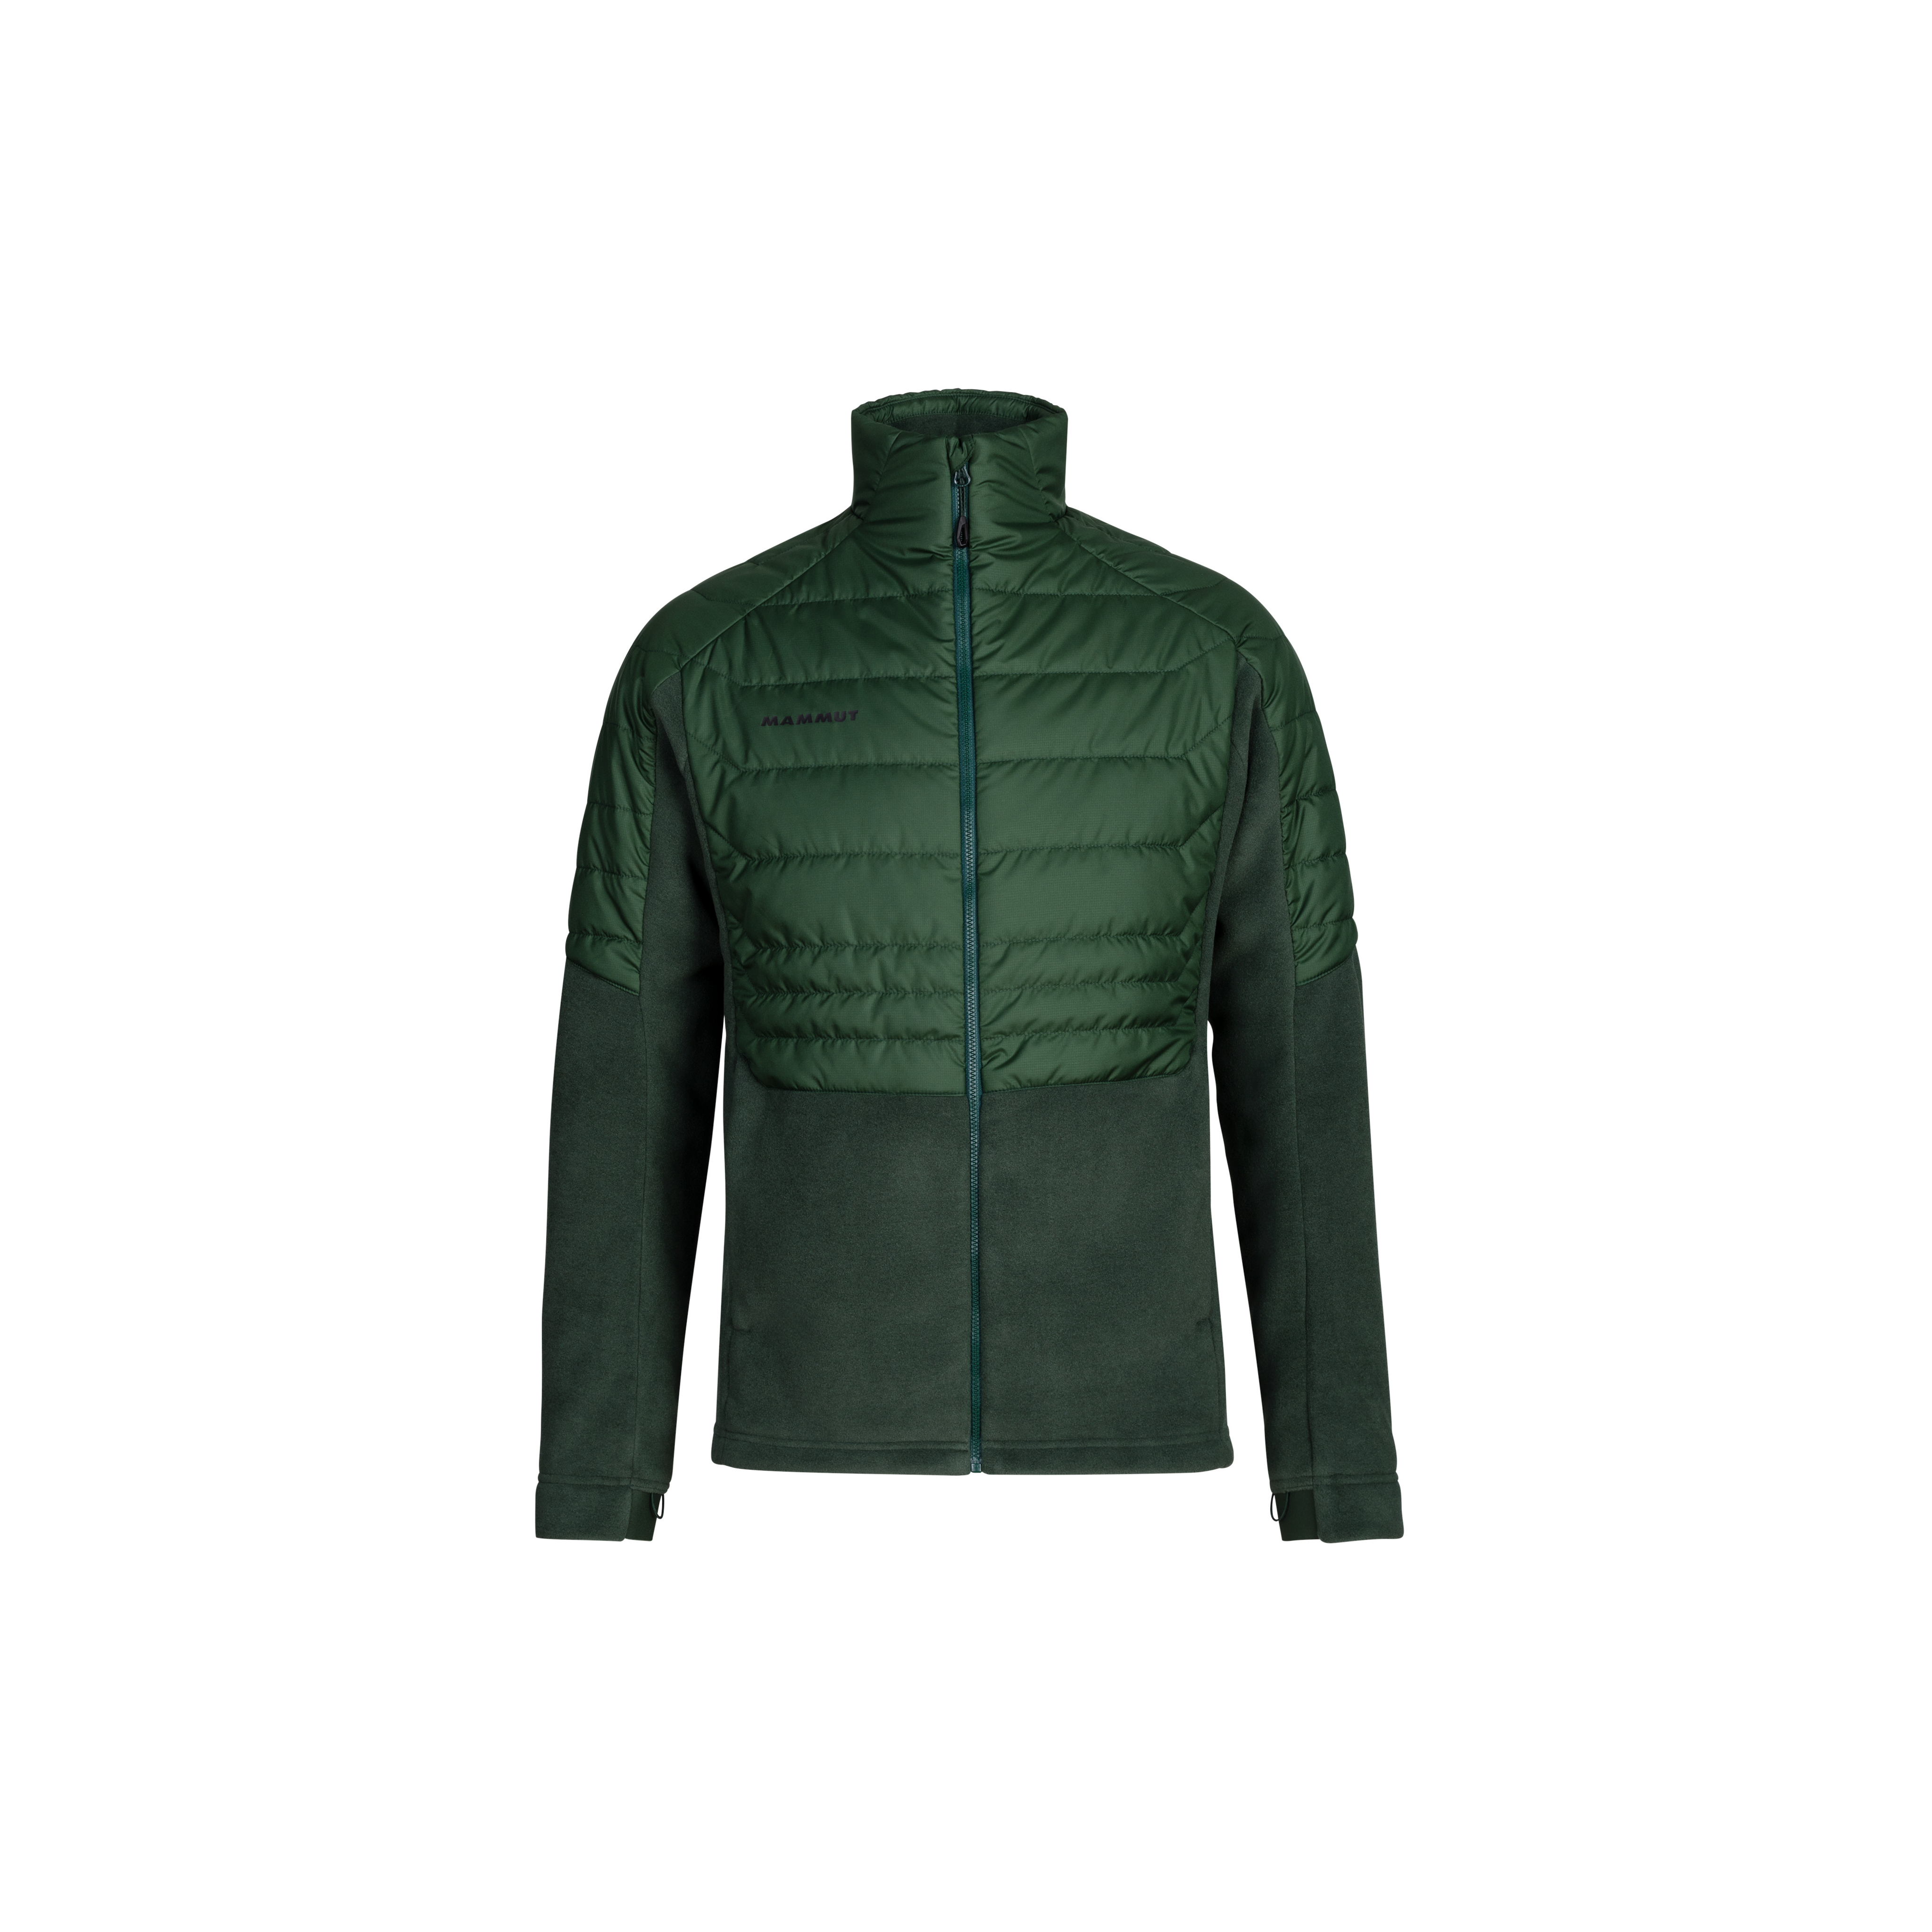 Innominata ML Hybrid Jacket Men - S, woods thumbnail